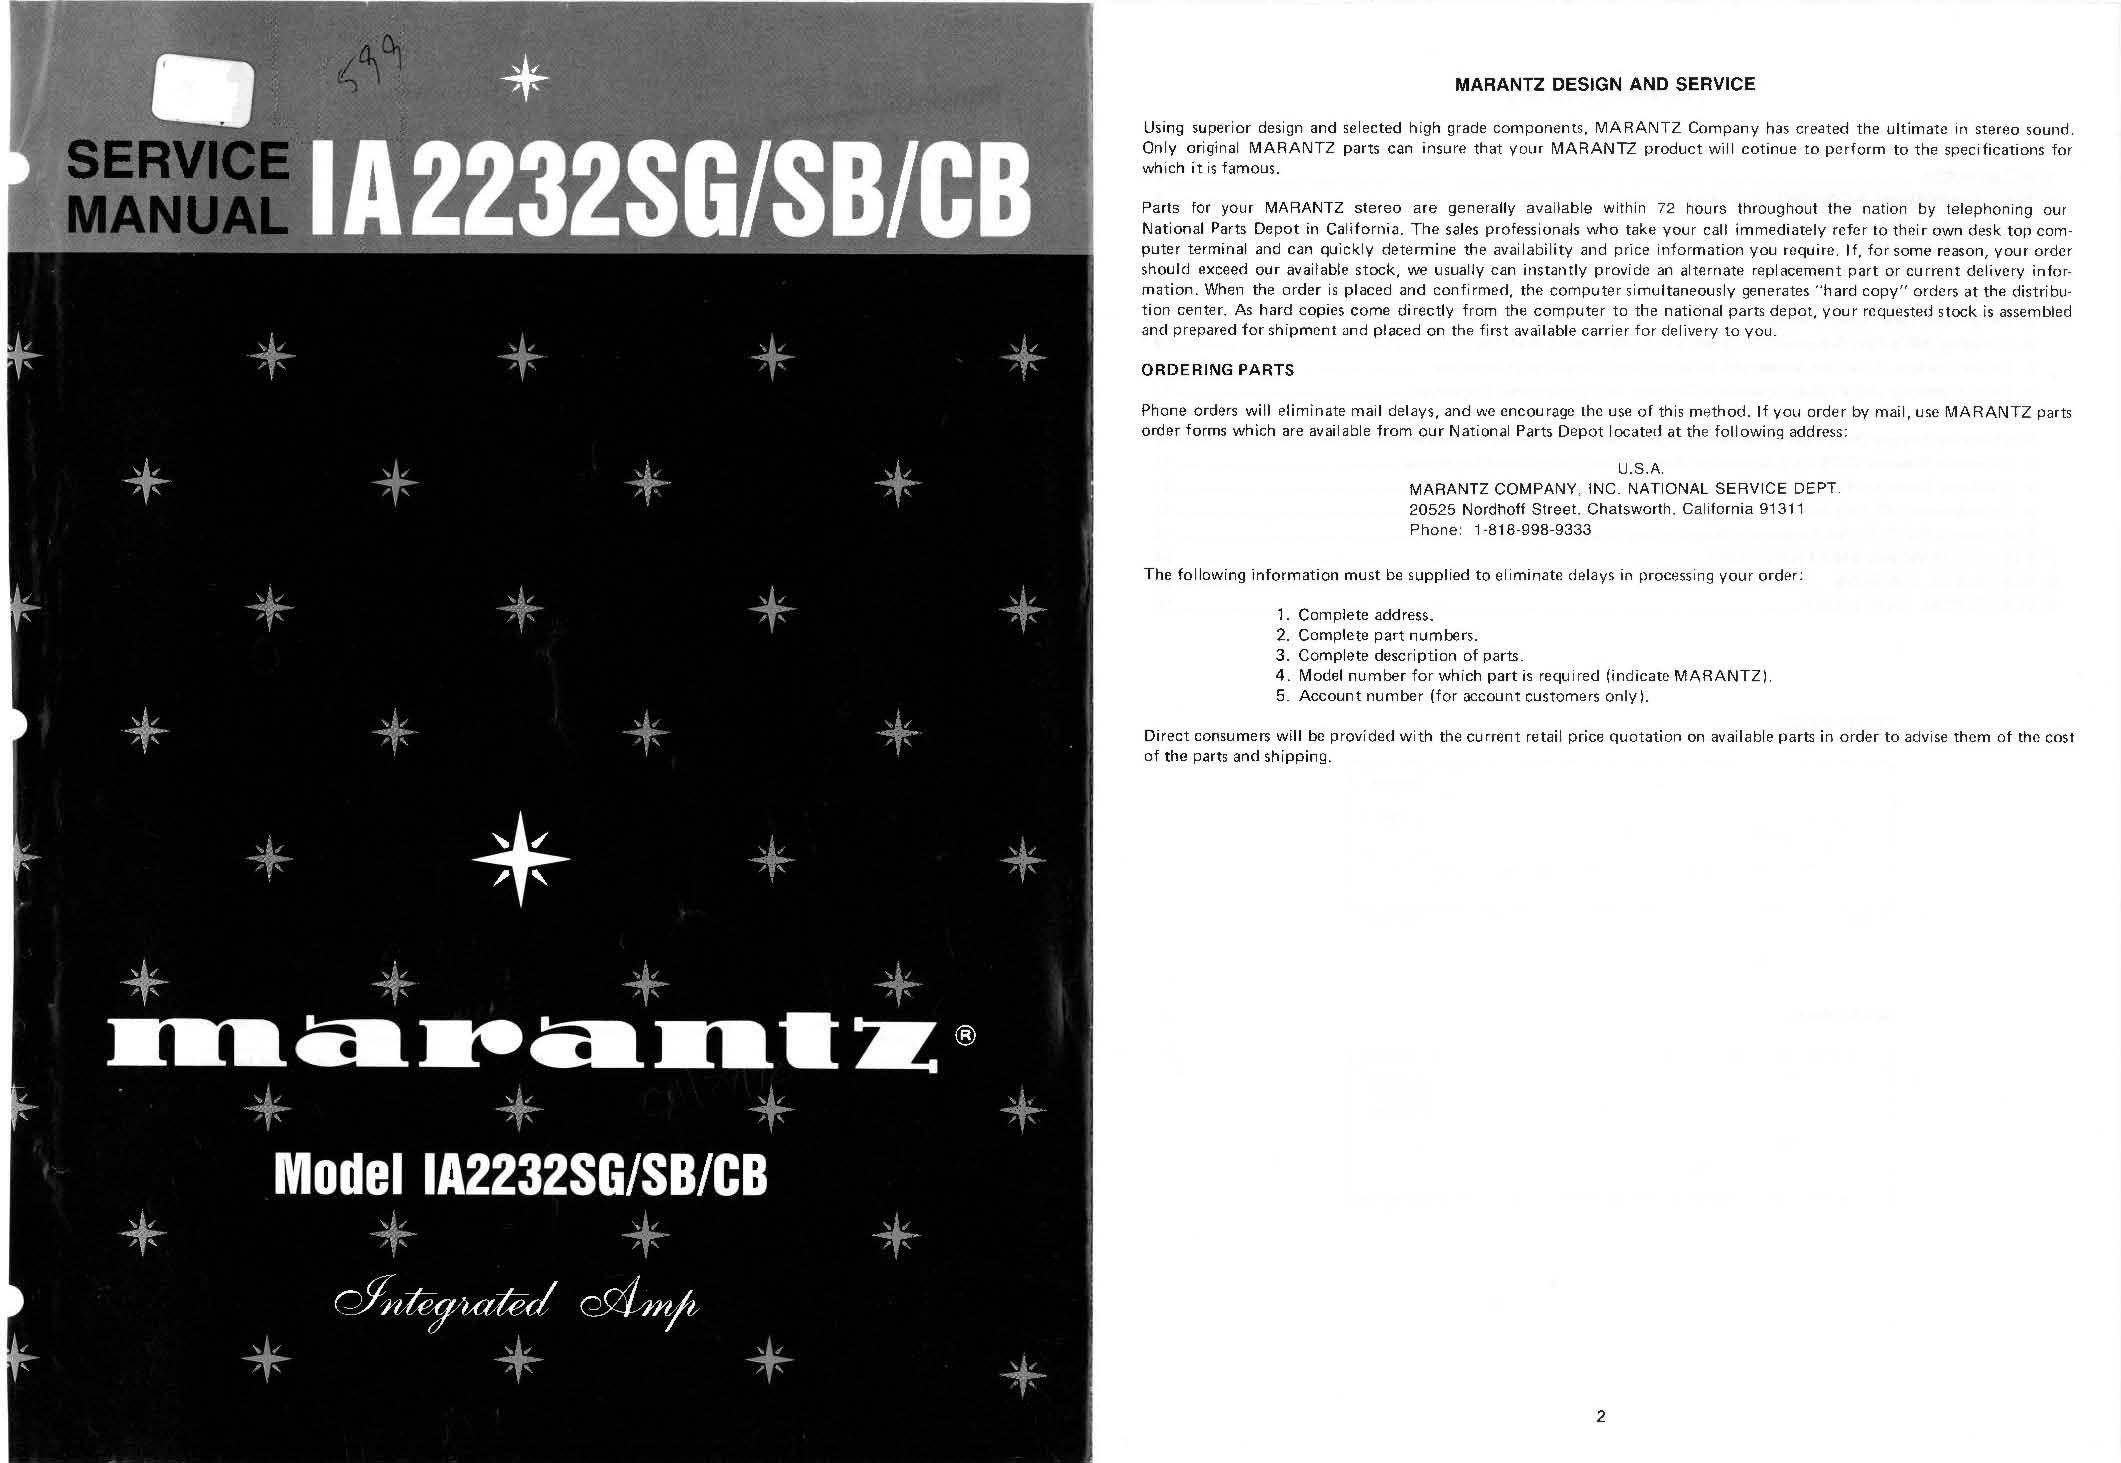 Customer service manual for retail array marantz ia2232sg service manual marantz amazon com books rh amazon fandeluxe Choice Image